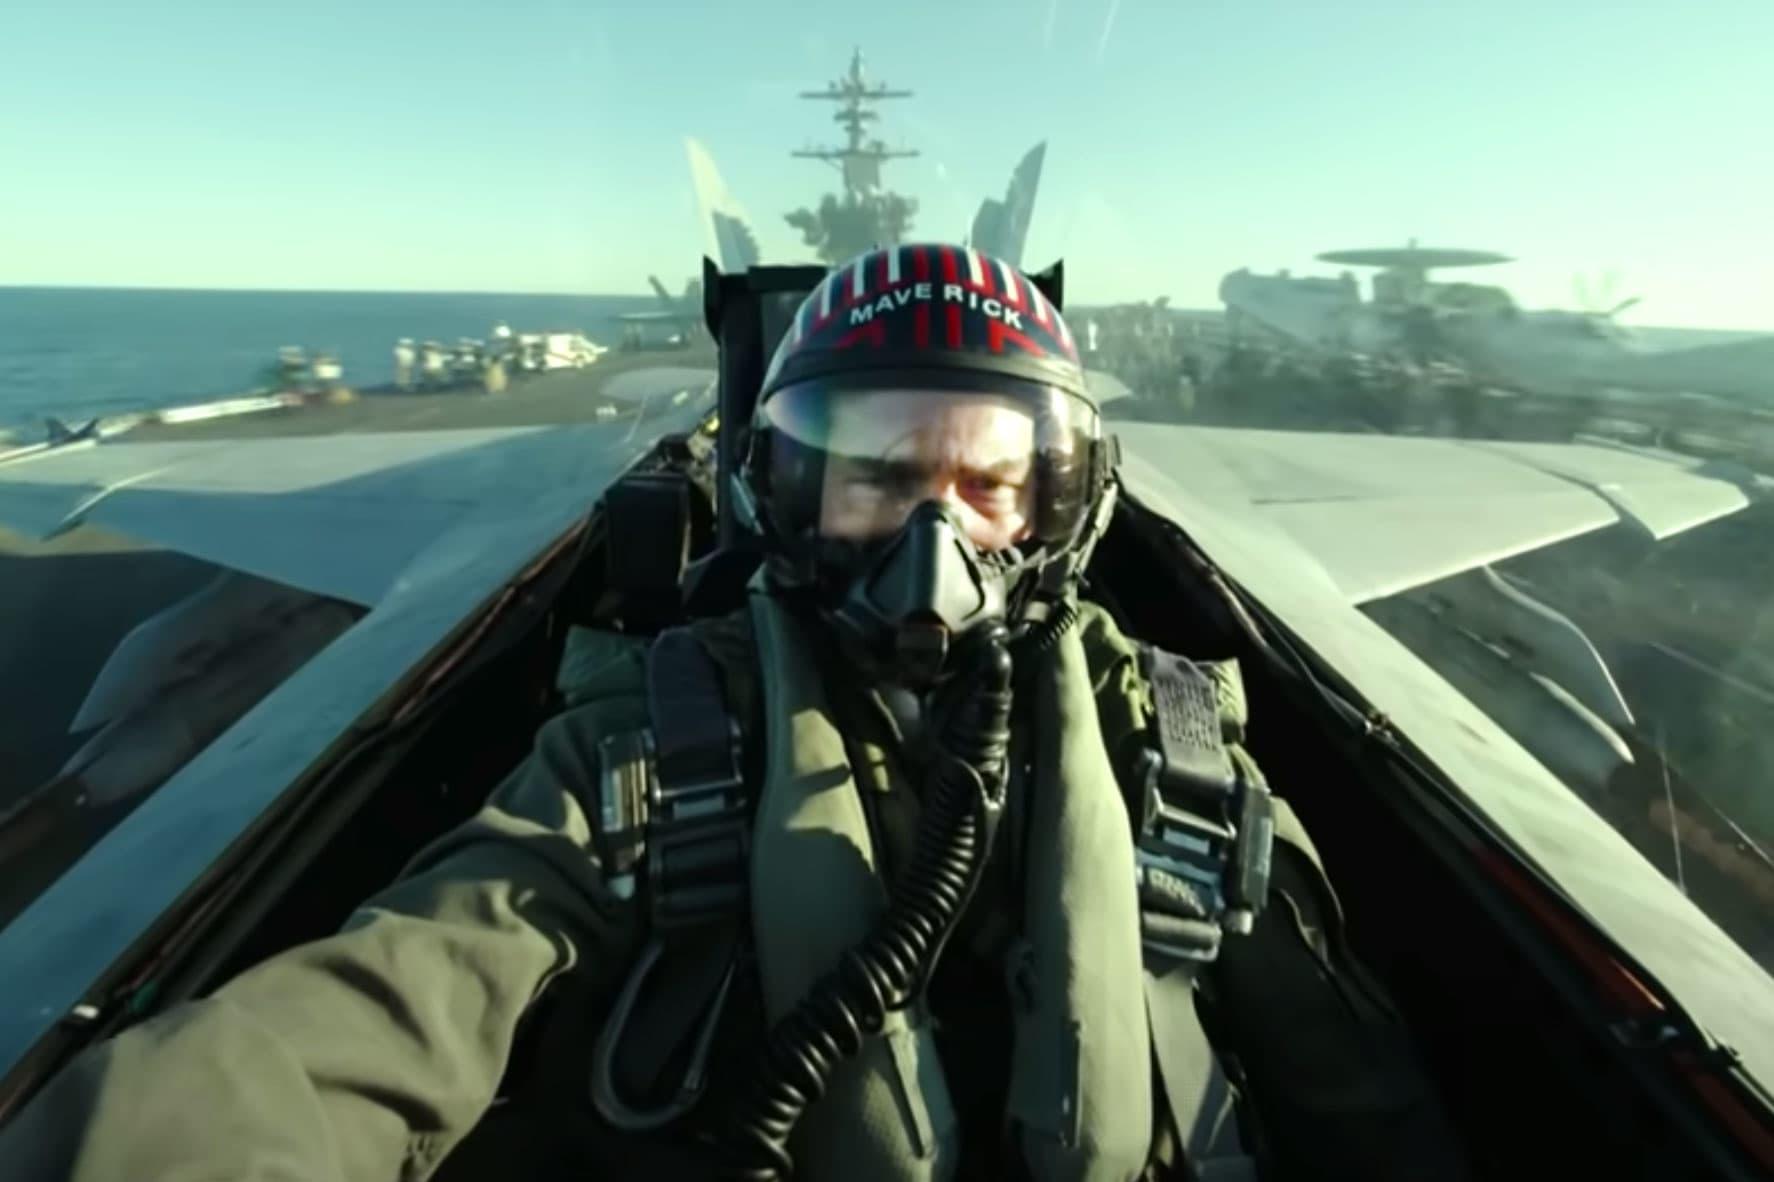 Top Gun: Maverick' movie release postponed to 2022 due to coronavirus surge